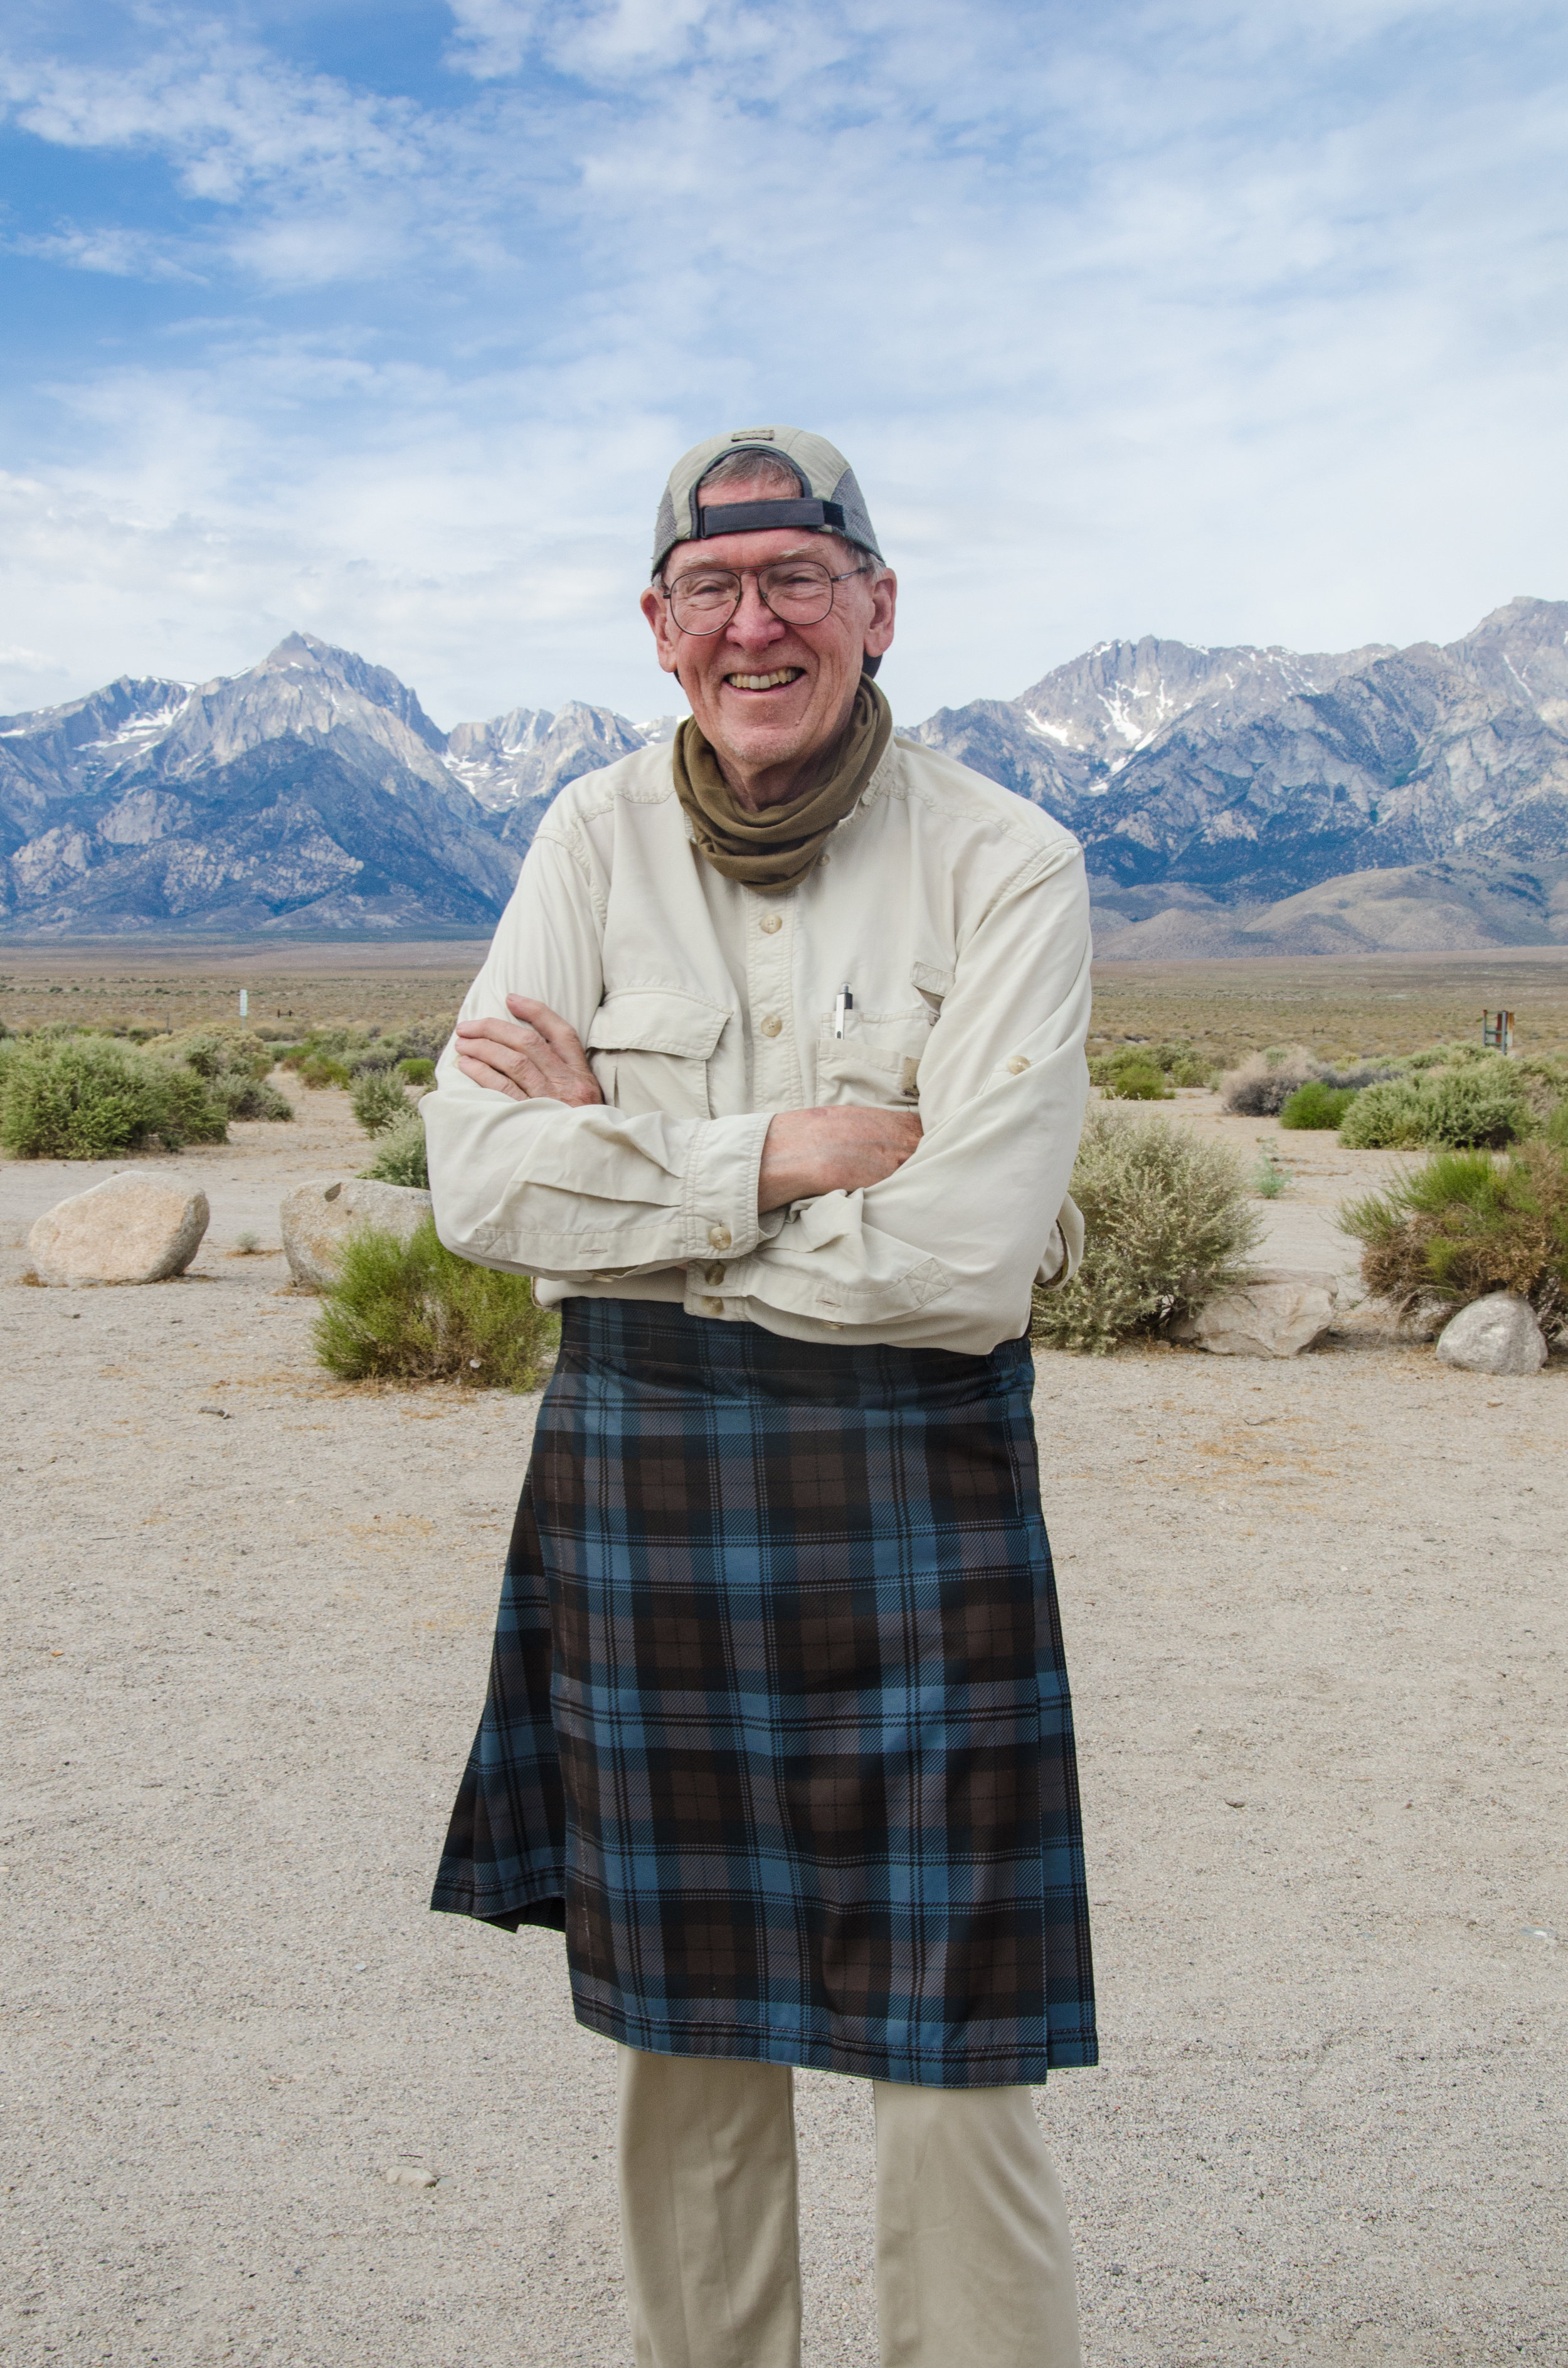 Author of the Annual JMT hiker Survey, John Ladd